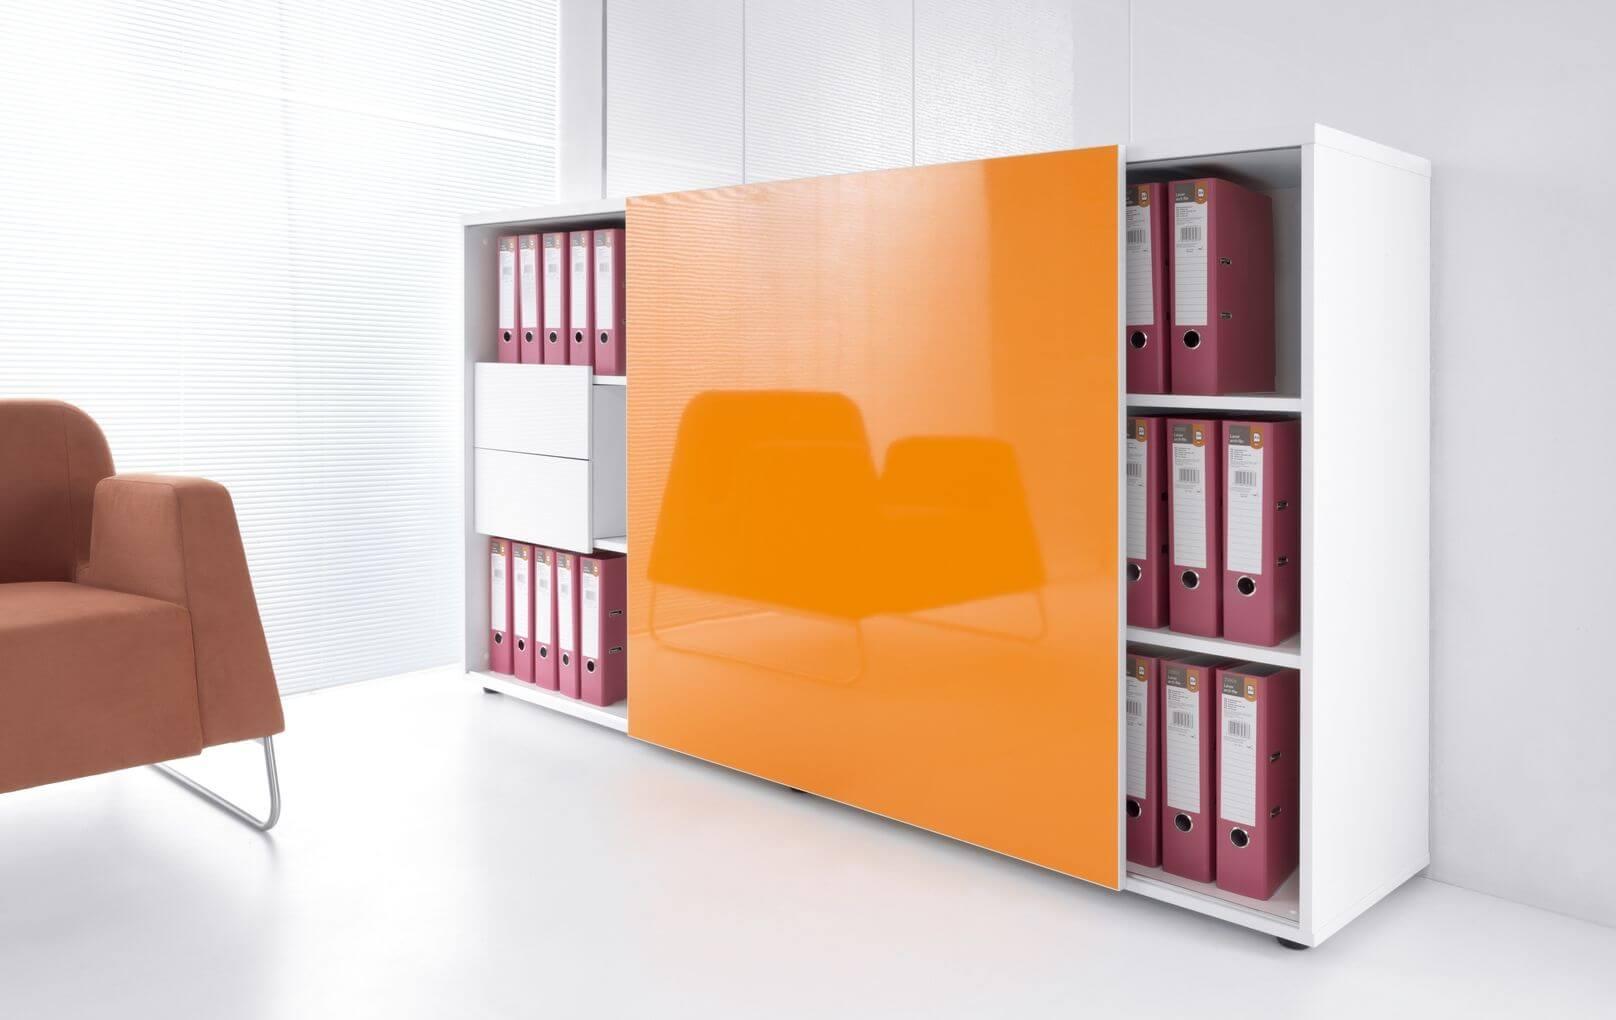 schiebet renschrank managerschrank b rom bel. Black Bedroom Furniture Sets. Home Design Ideas